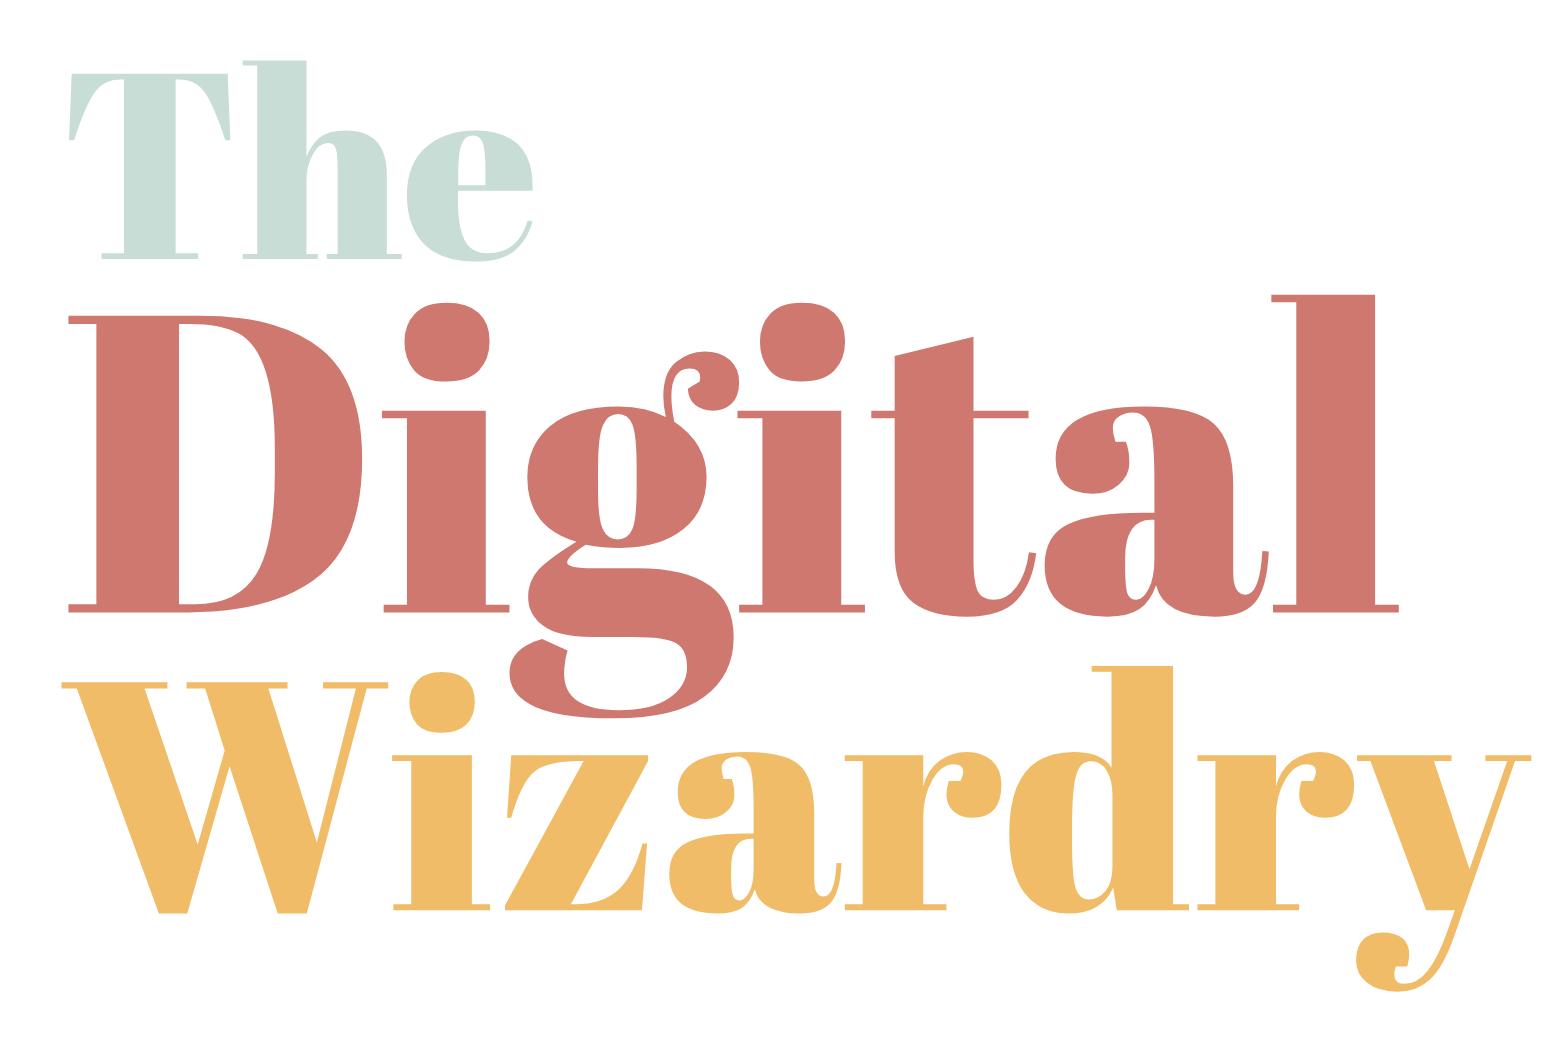 The Digital Wizardry